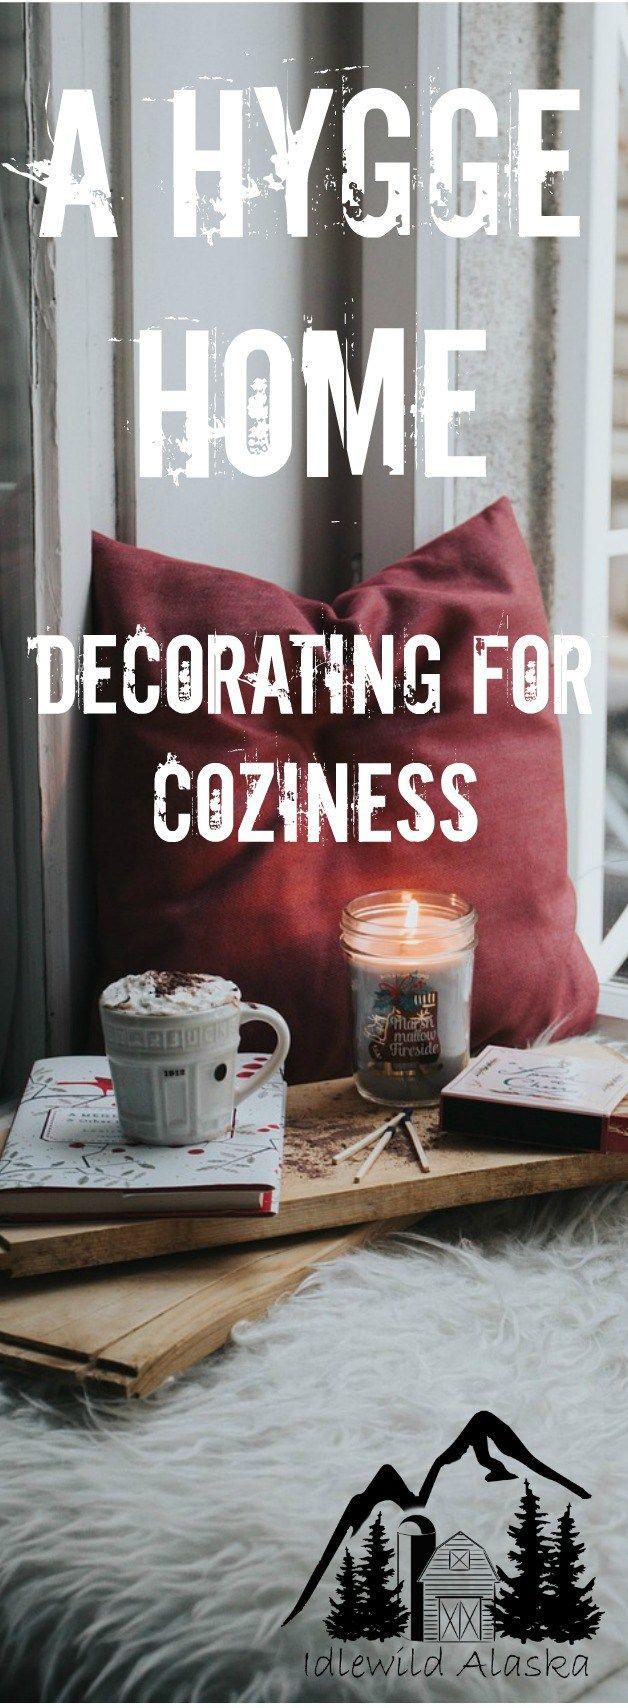 A Hygge Home - Decorating for Coziness - IdlewildAlaska